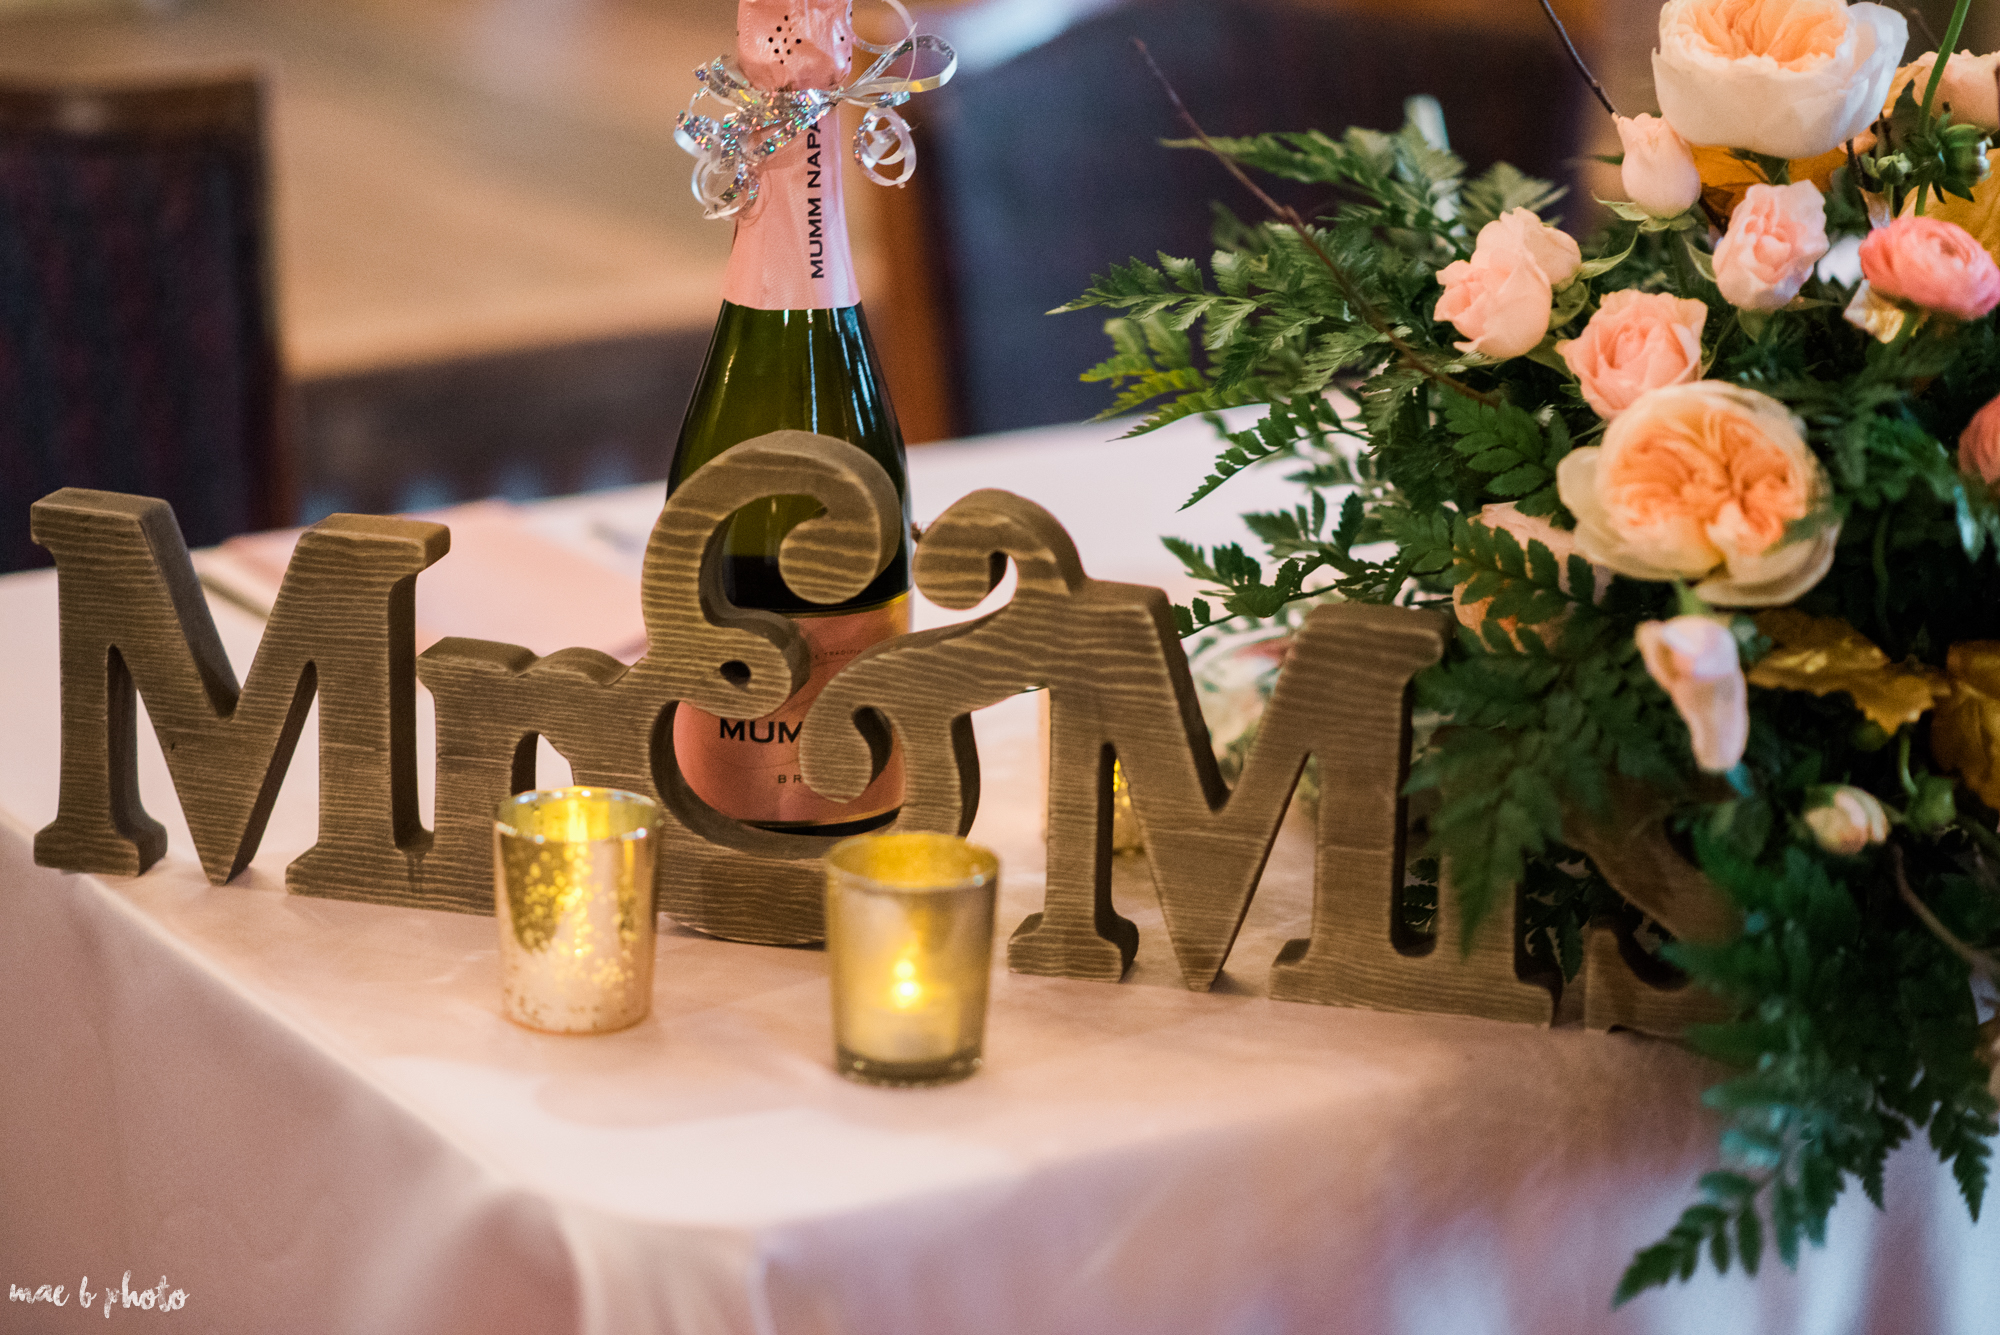 Sarah & Dustin's Rustic Chic Barn Wedding at Hartford Hill Winery in Hartford, Ohio by Mae B Photo-107.jpg